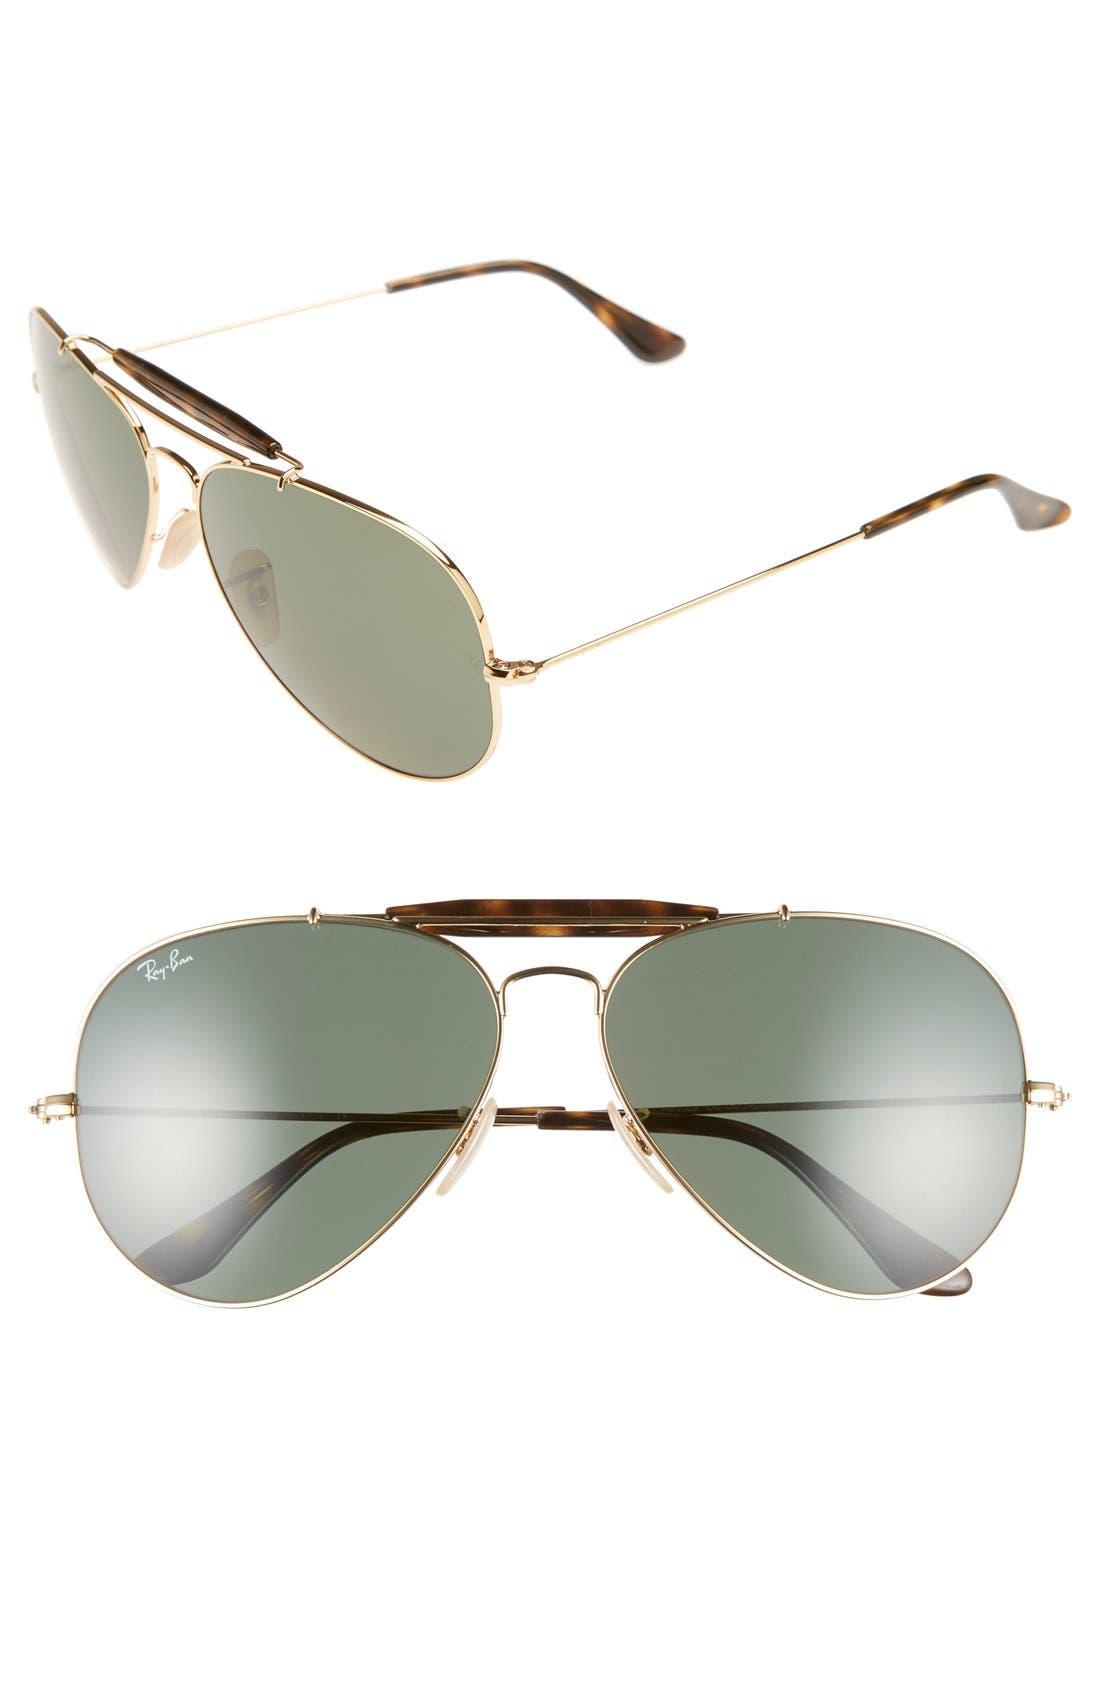 Main Image - Ray-Ban 'Outdoorsman II' 62mm Sunglasses